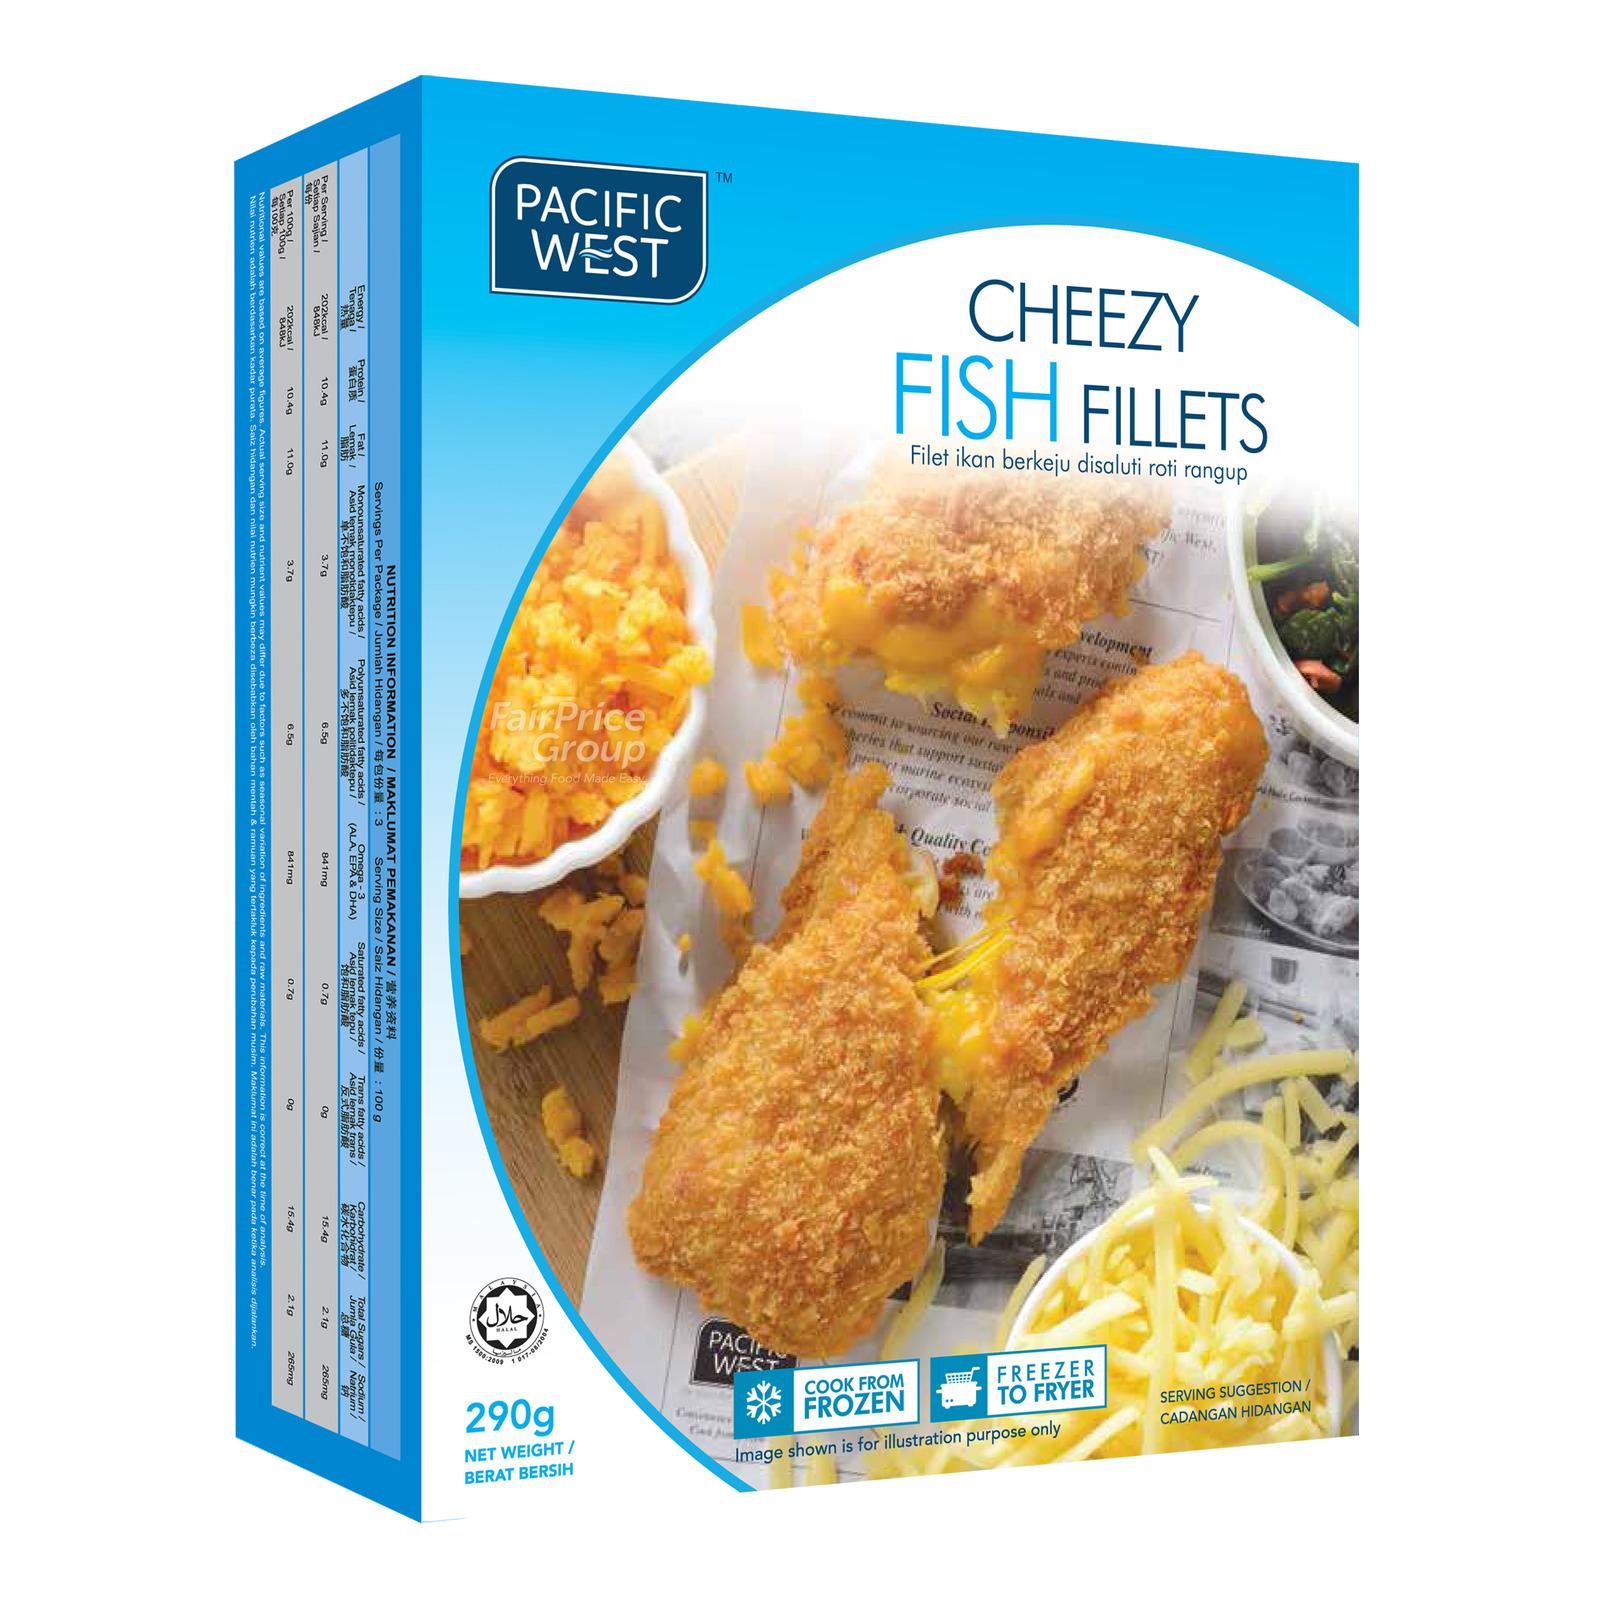 Pacific West Frozen Fish Fillets - Cheezy